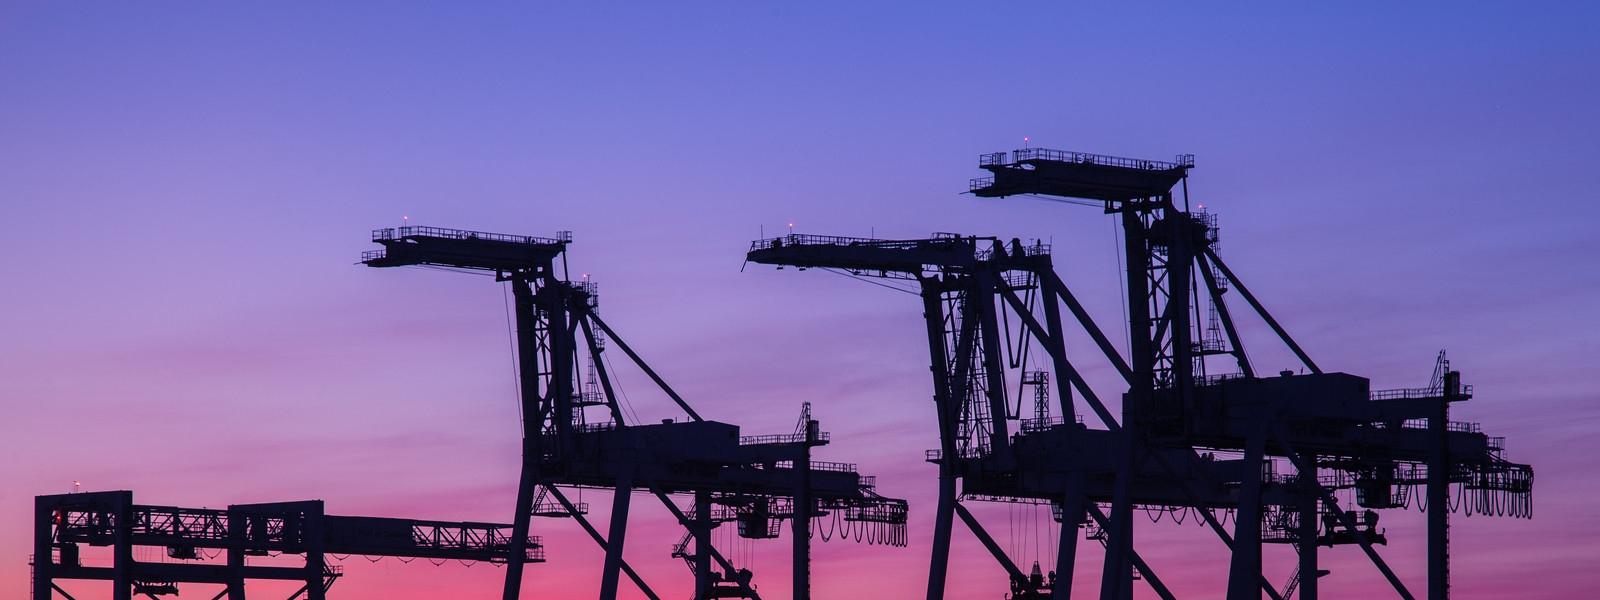 140616 9086 Port Of Oakland Cranes At Sunset X3